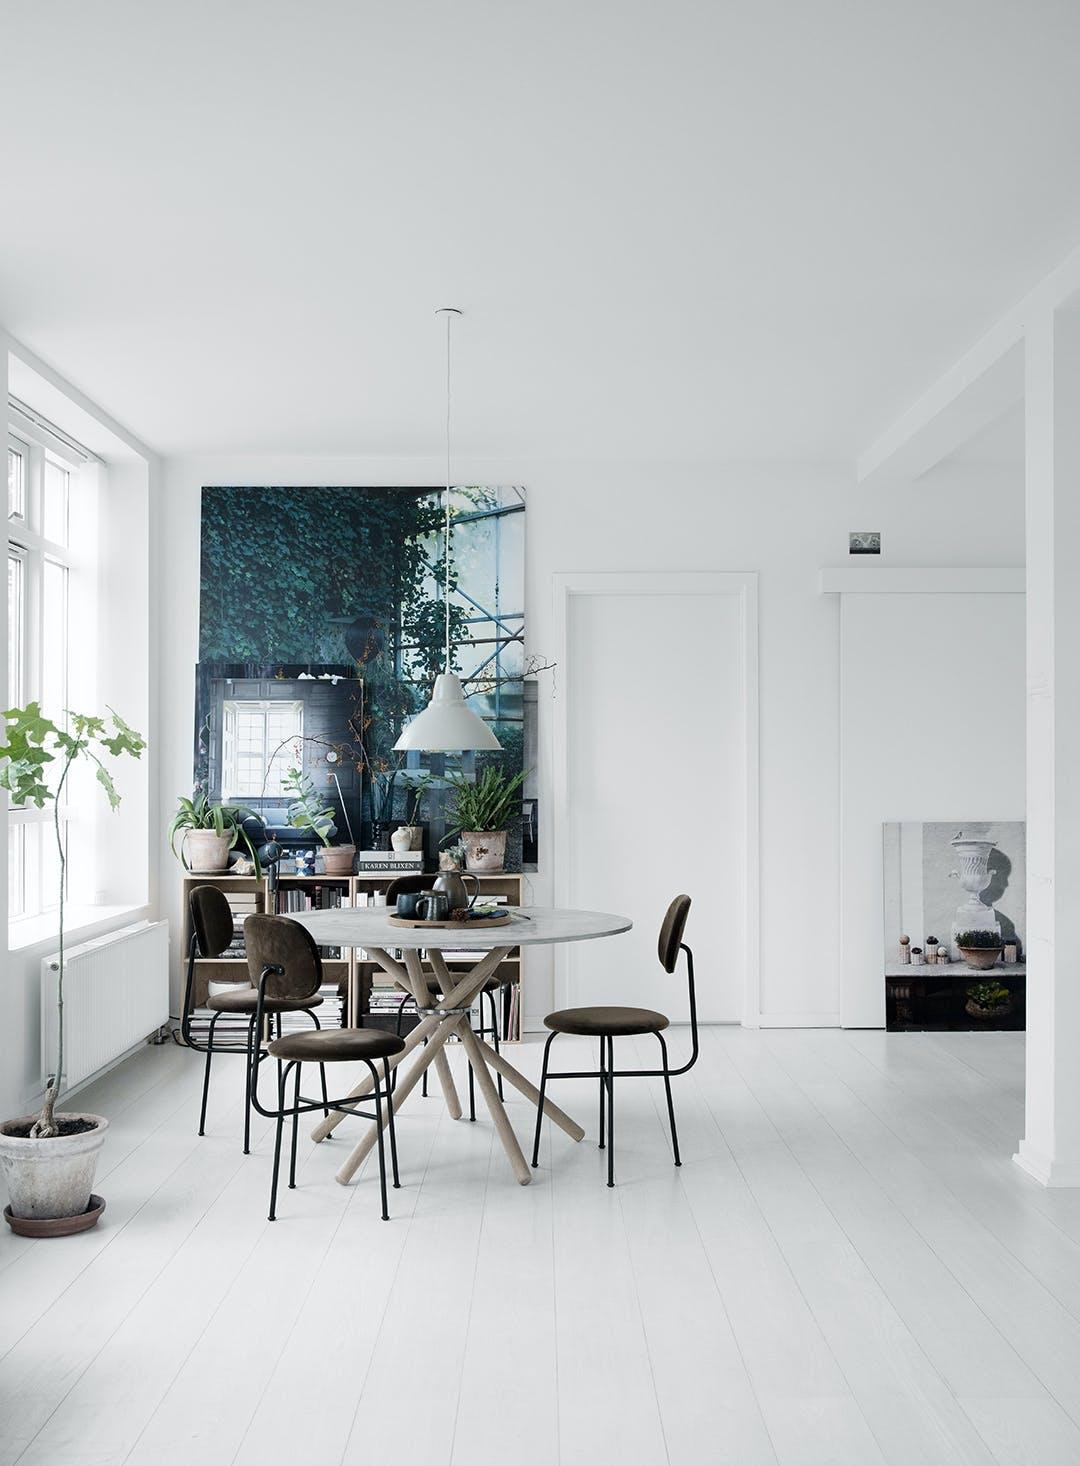 spisestue spisebord beton planter lyst